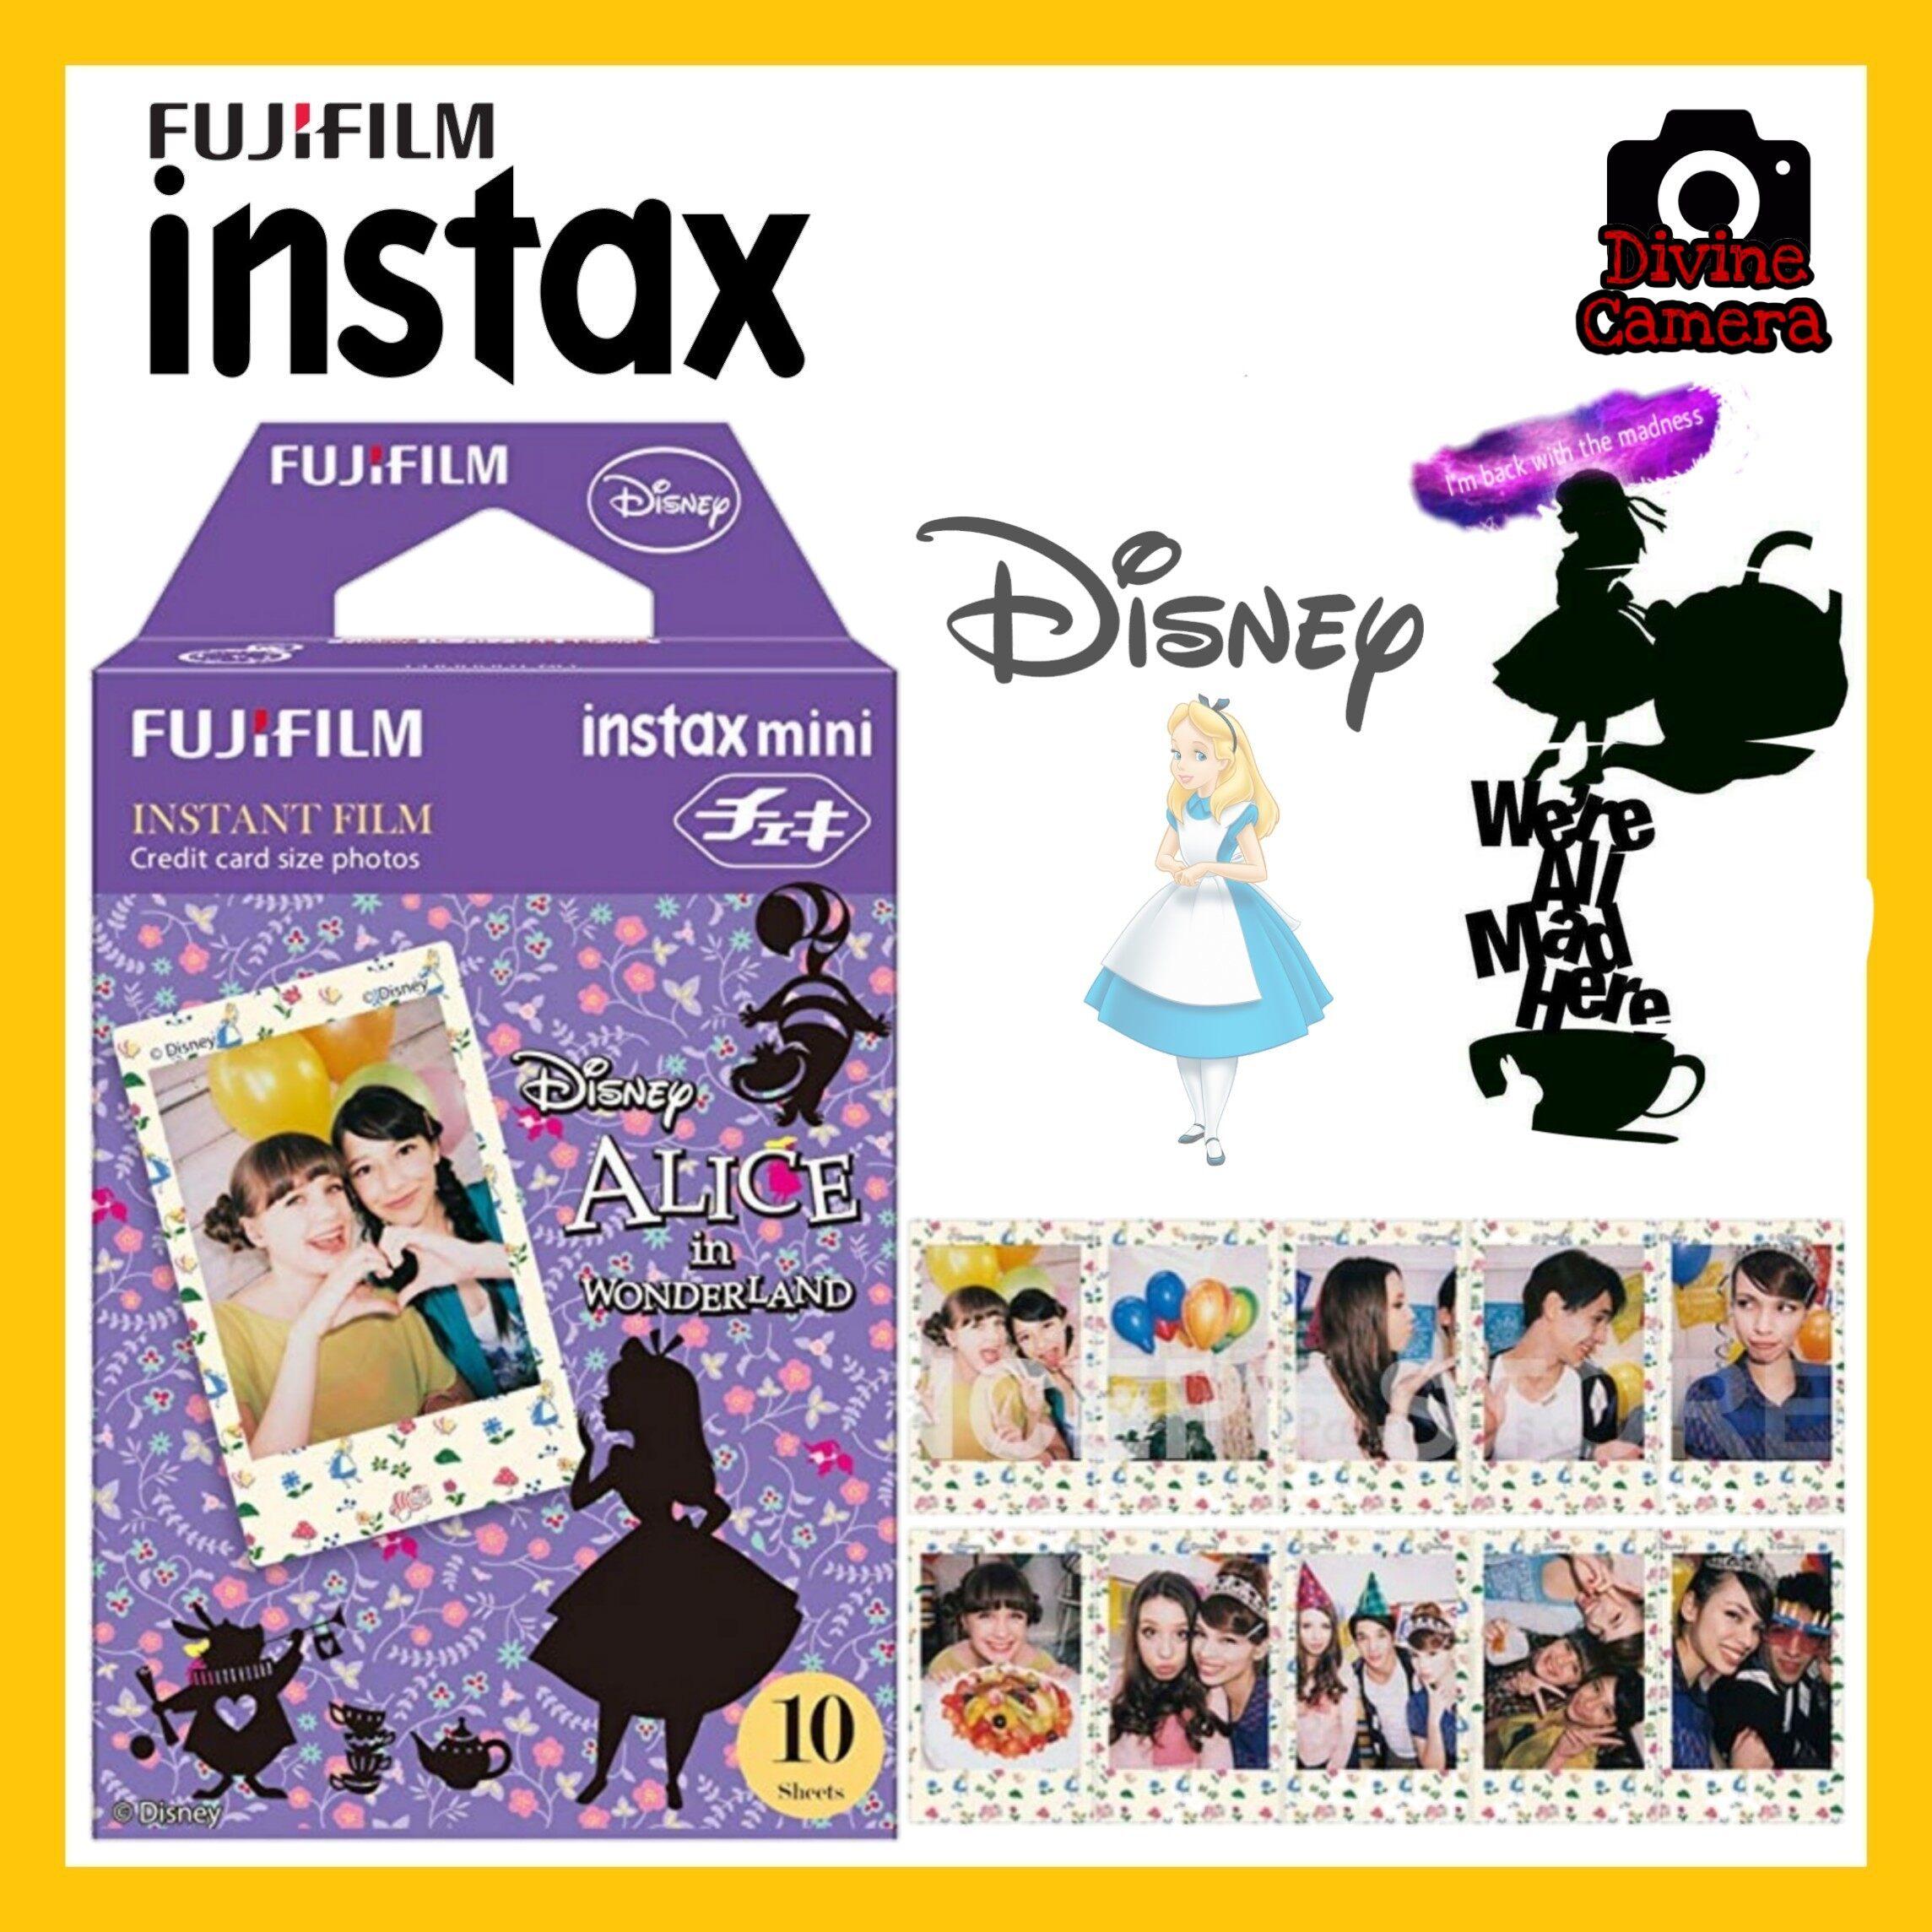 FUJIFILM INSTAX Mini Disney\'s Alice in the Wonderland Instant Film (10 Sheets)